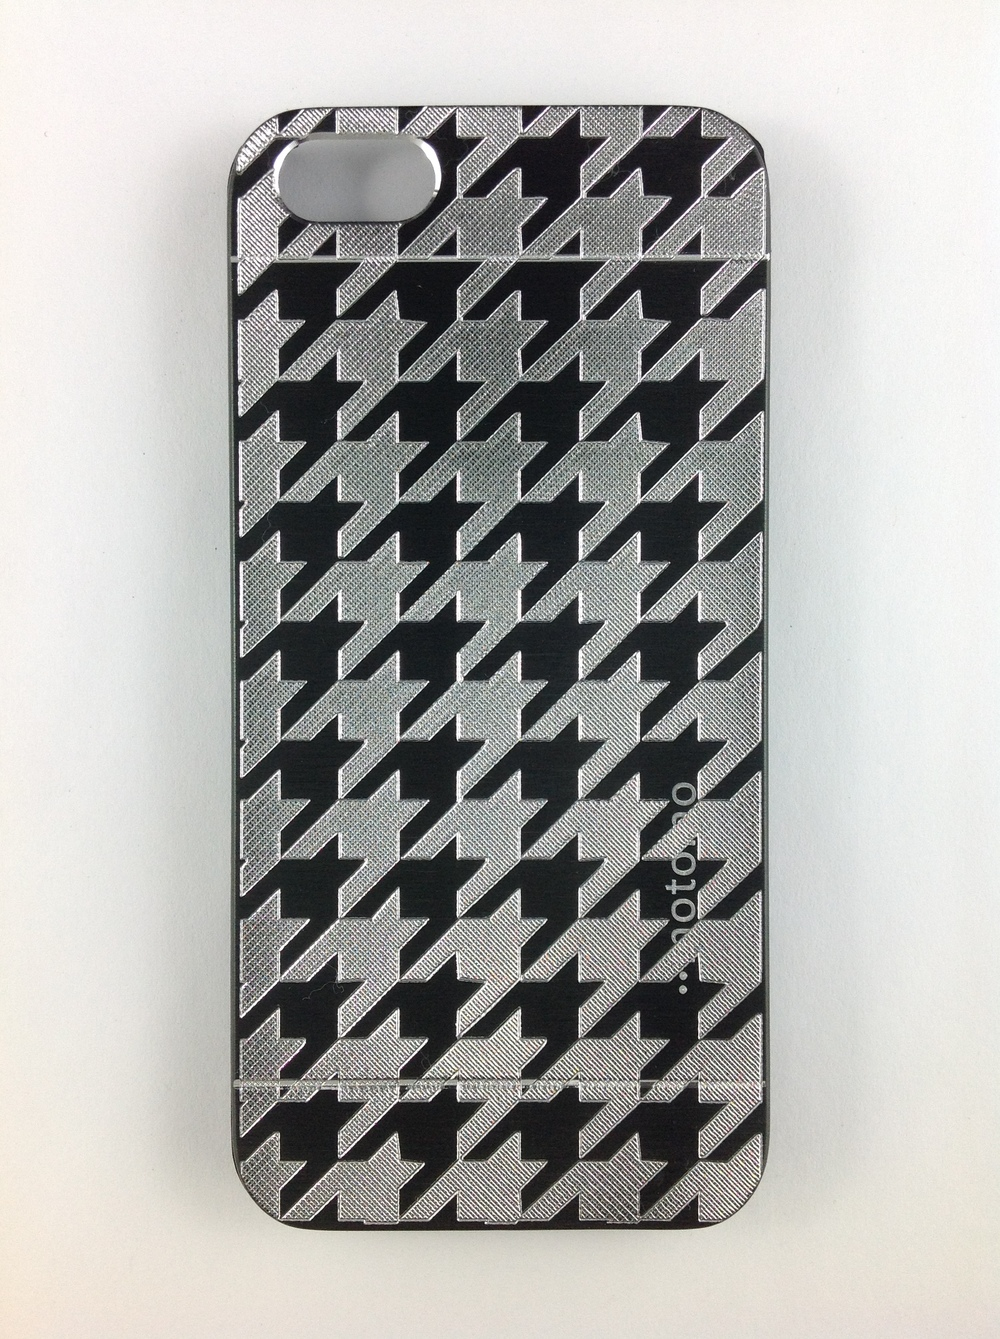 DigitalCarver-iPhone5s-IMG_3700.JPG